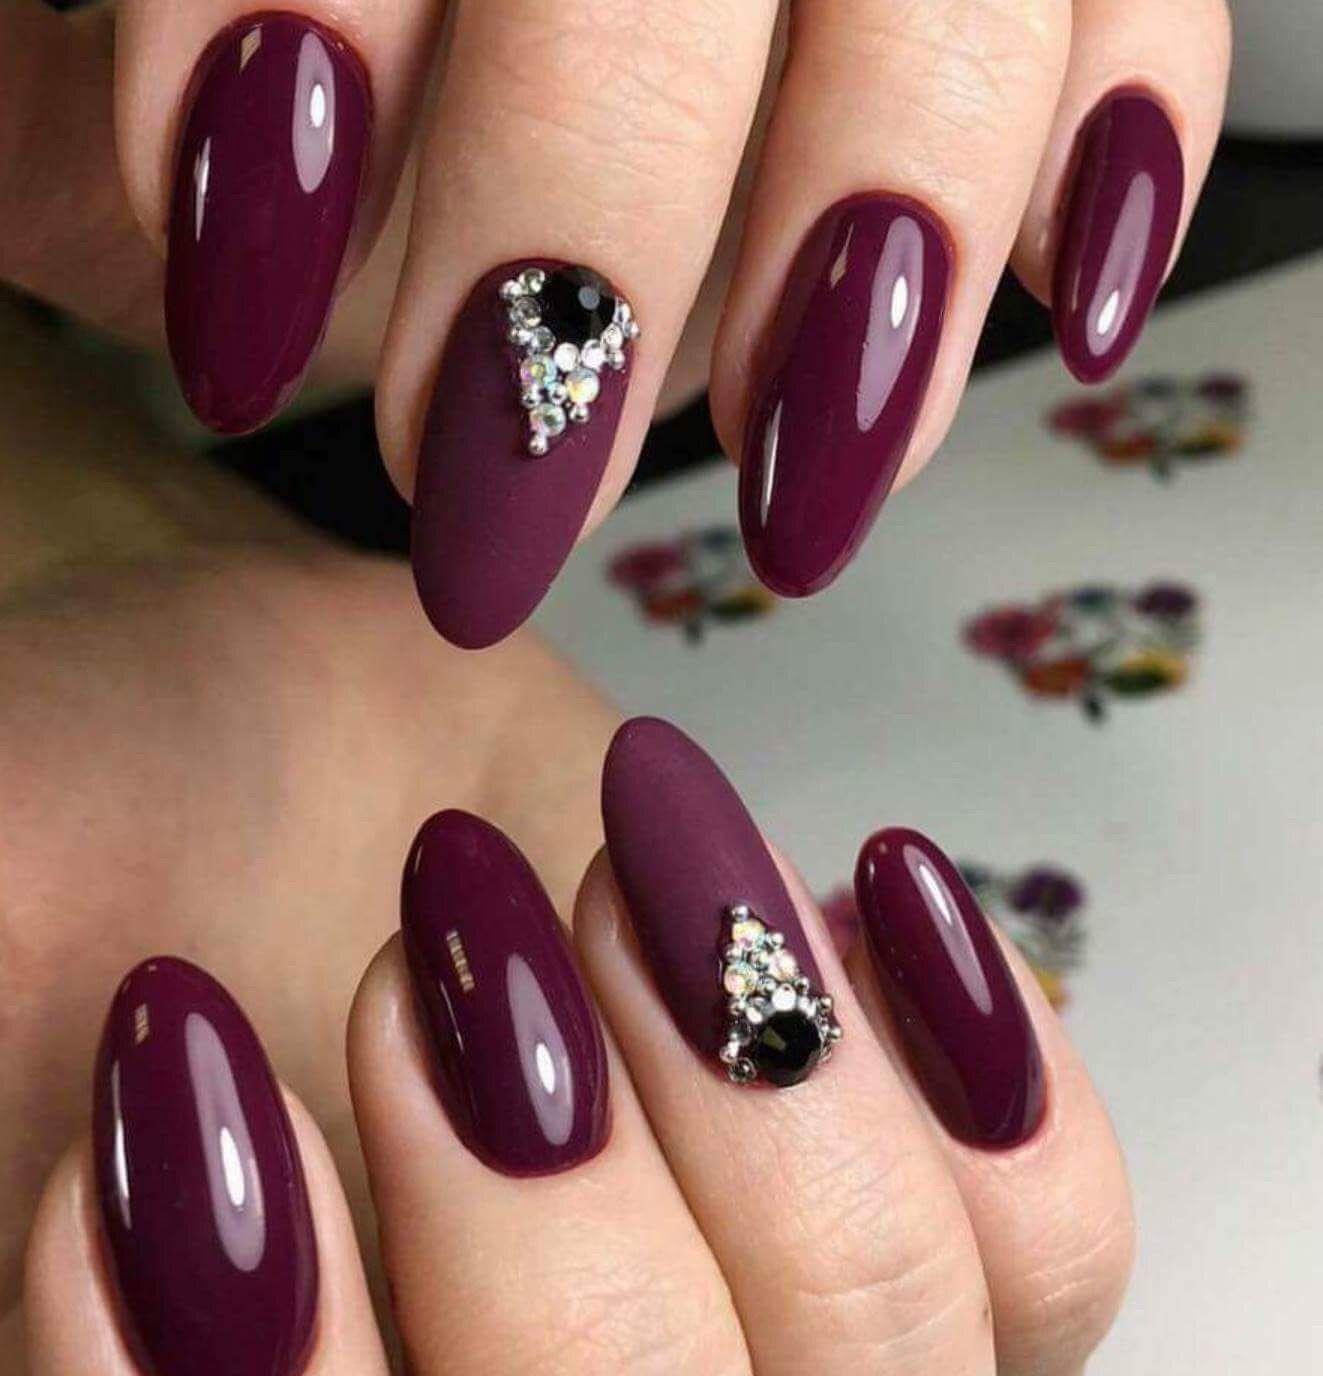 Pin by Linda Berger on Nails | Pinterest | Manicure, Stylish nails ...